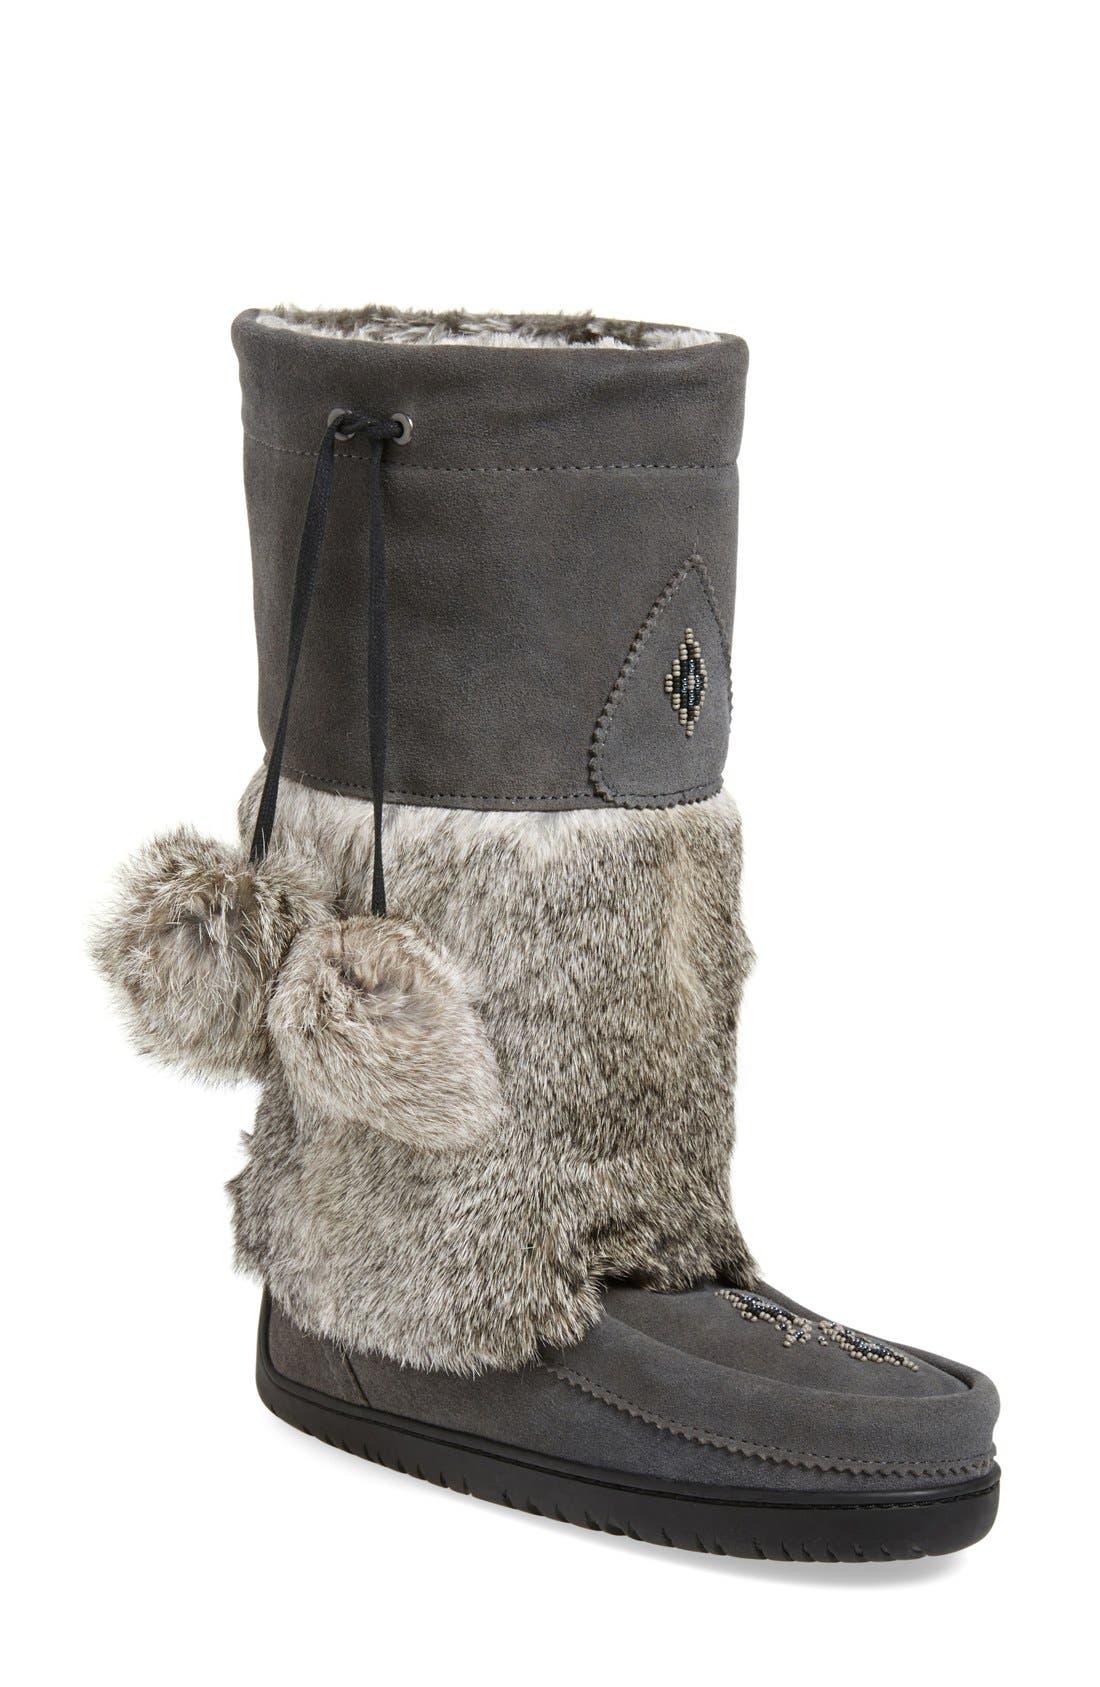 MANITOBAH MUKLUKS 'Snowy Owl' Genuine Fur & Suede